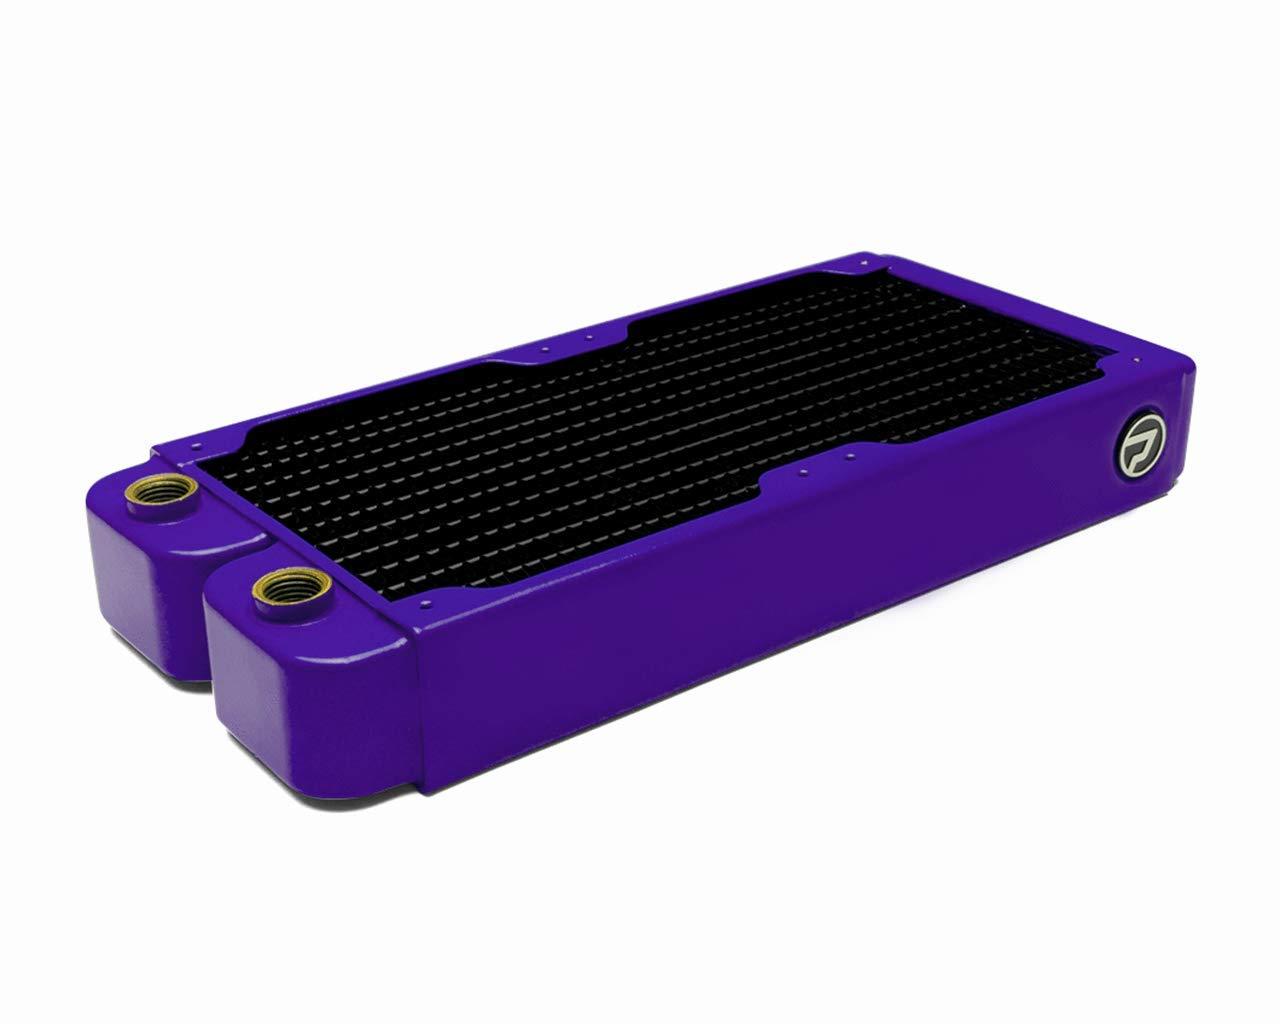 PrimoChill 240mm EximoSX Ultra Radiator - TX Matte Purple by PrimoChill